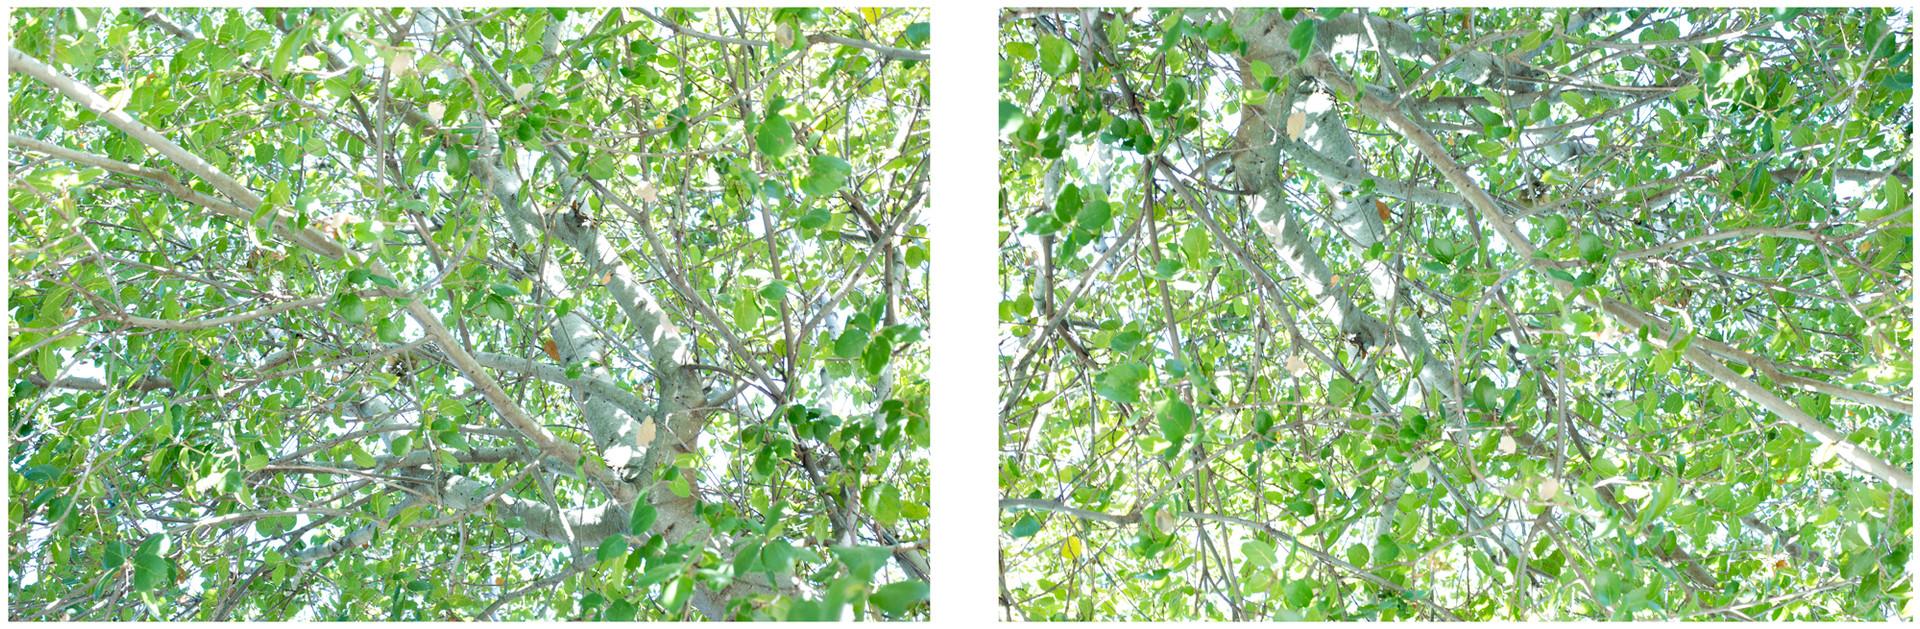 "23. ""The Greening"", 2014, by Ryan J. Bush"